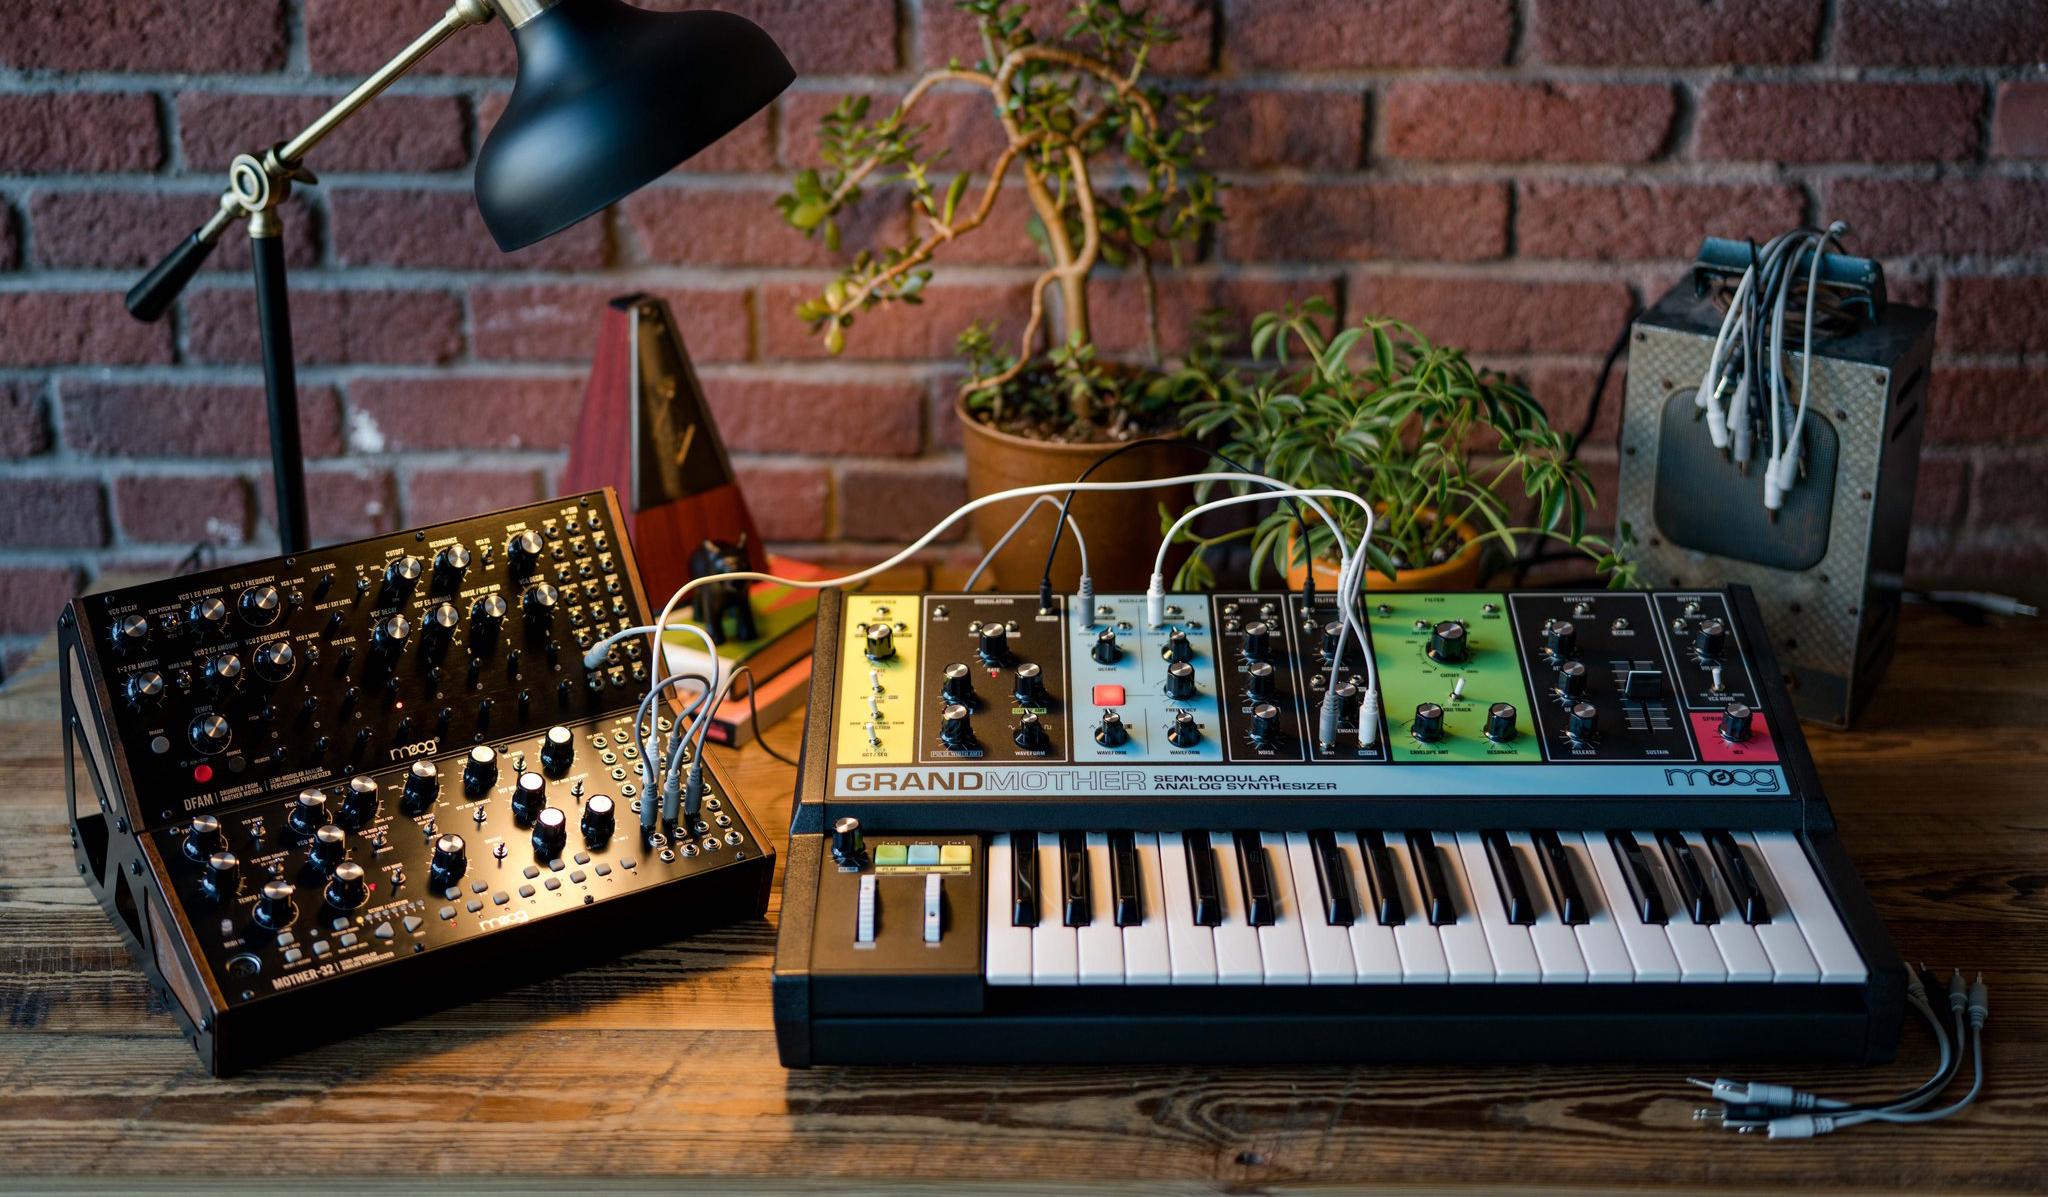 Moog Grandmother – Semimodulär analogsynt med fjäderreverb